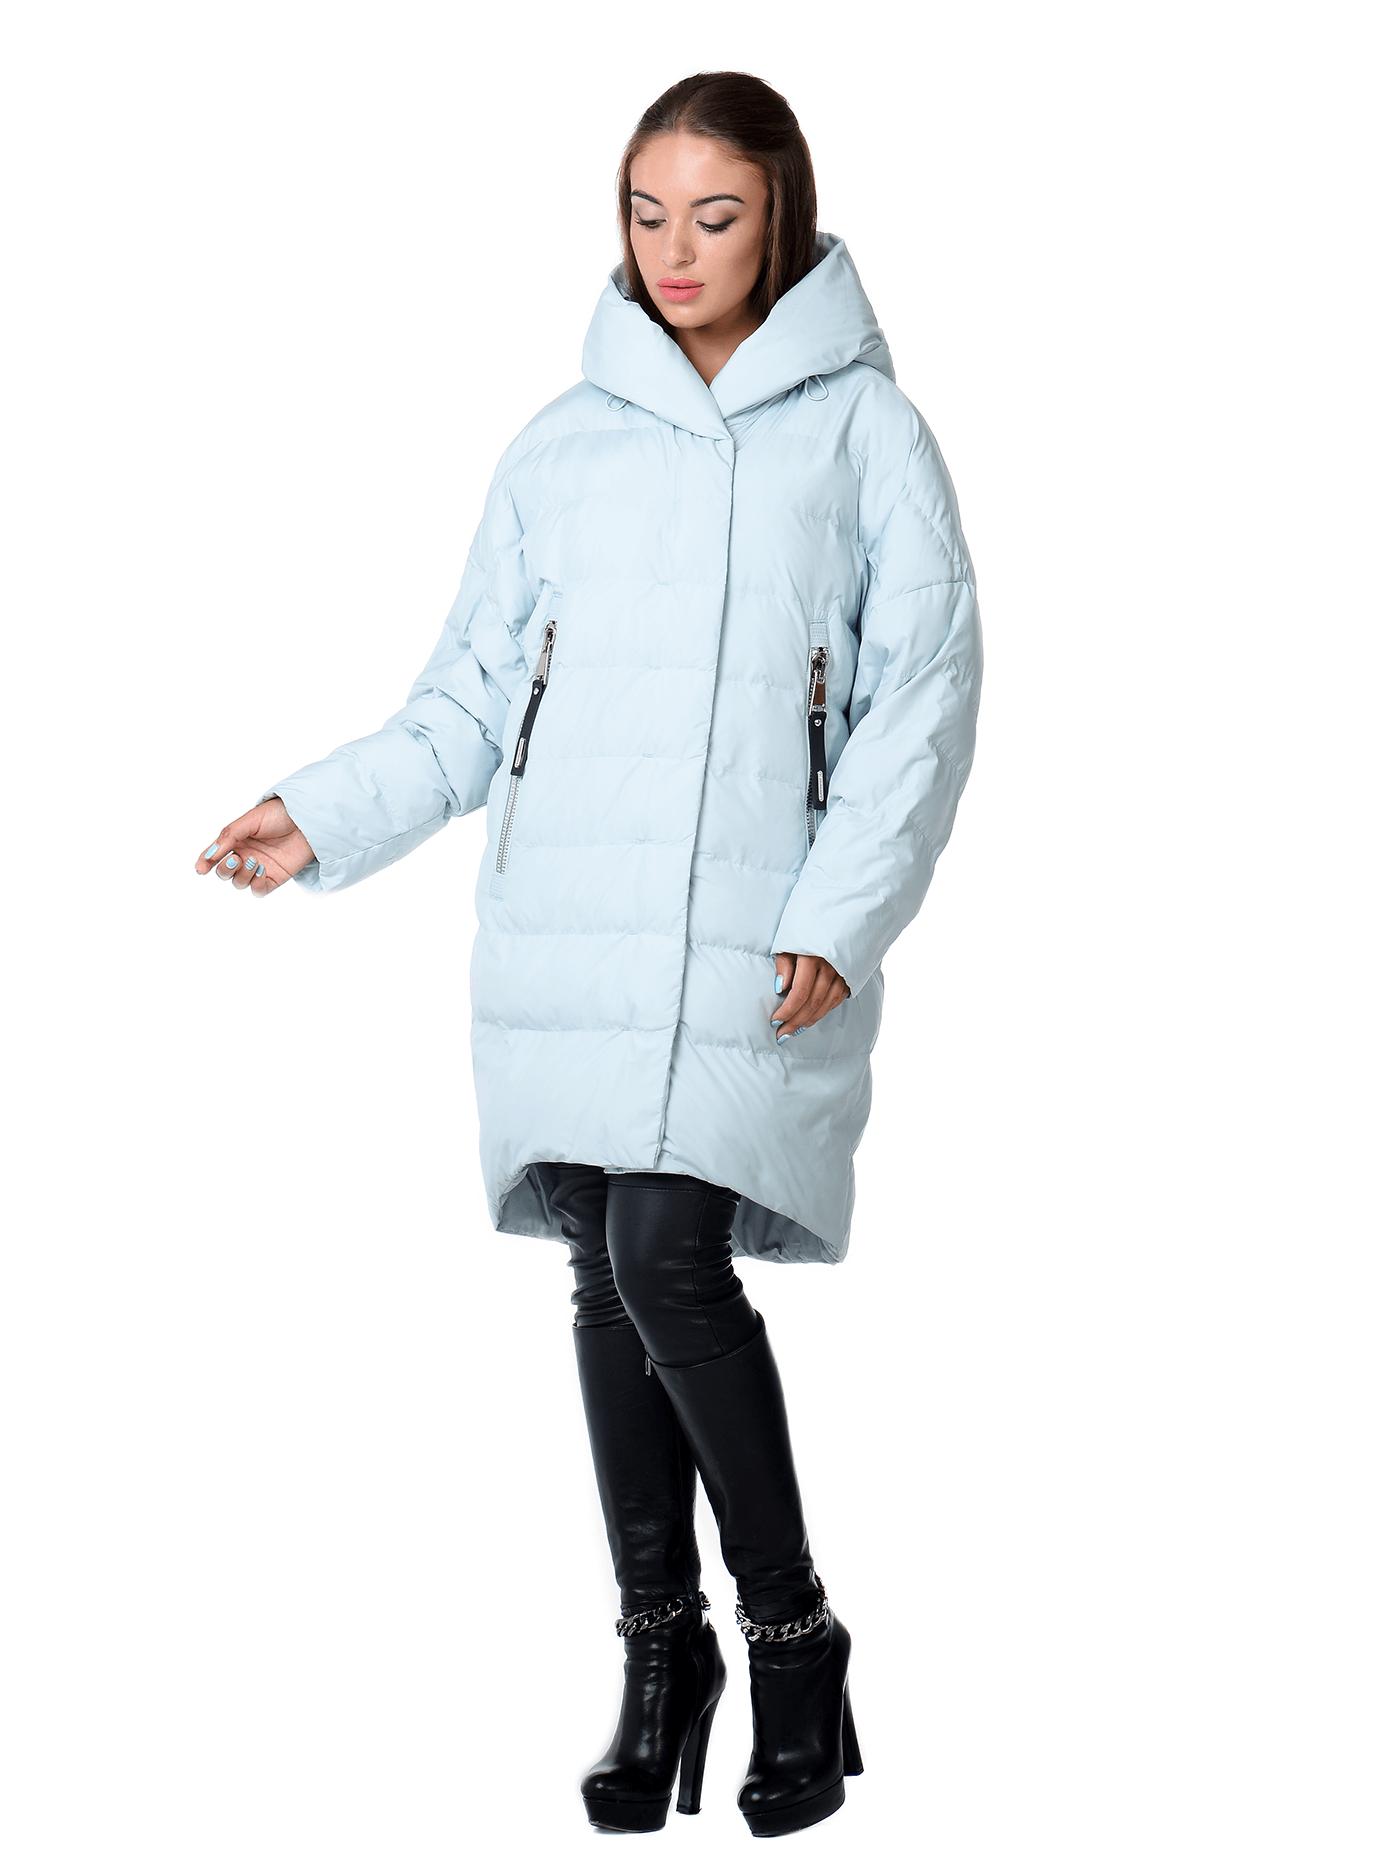 Куртка зимняя оверсайз Голубой S (02-SO19038): фото - Alster.ua